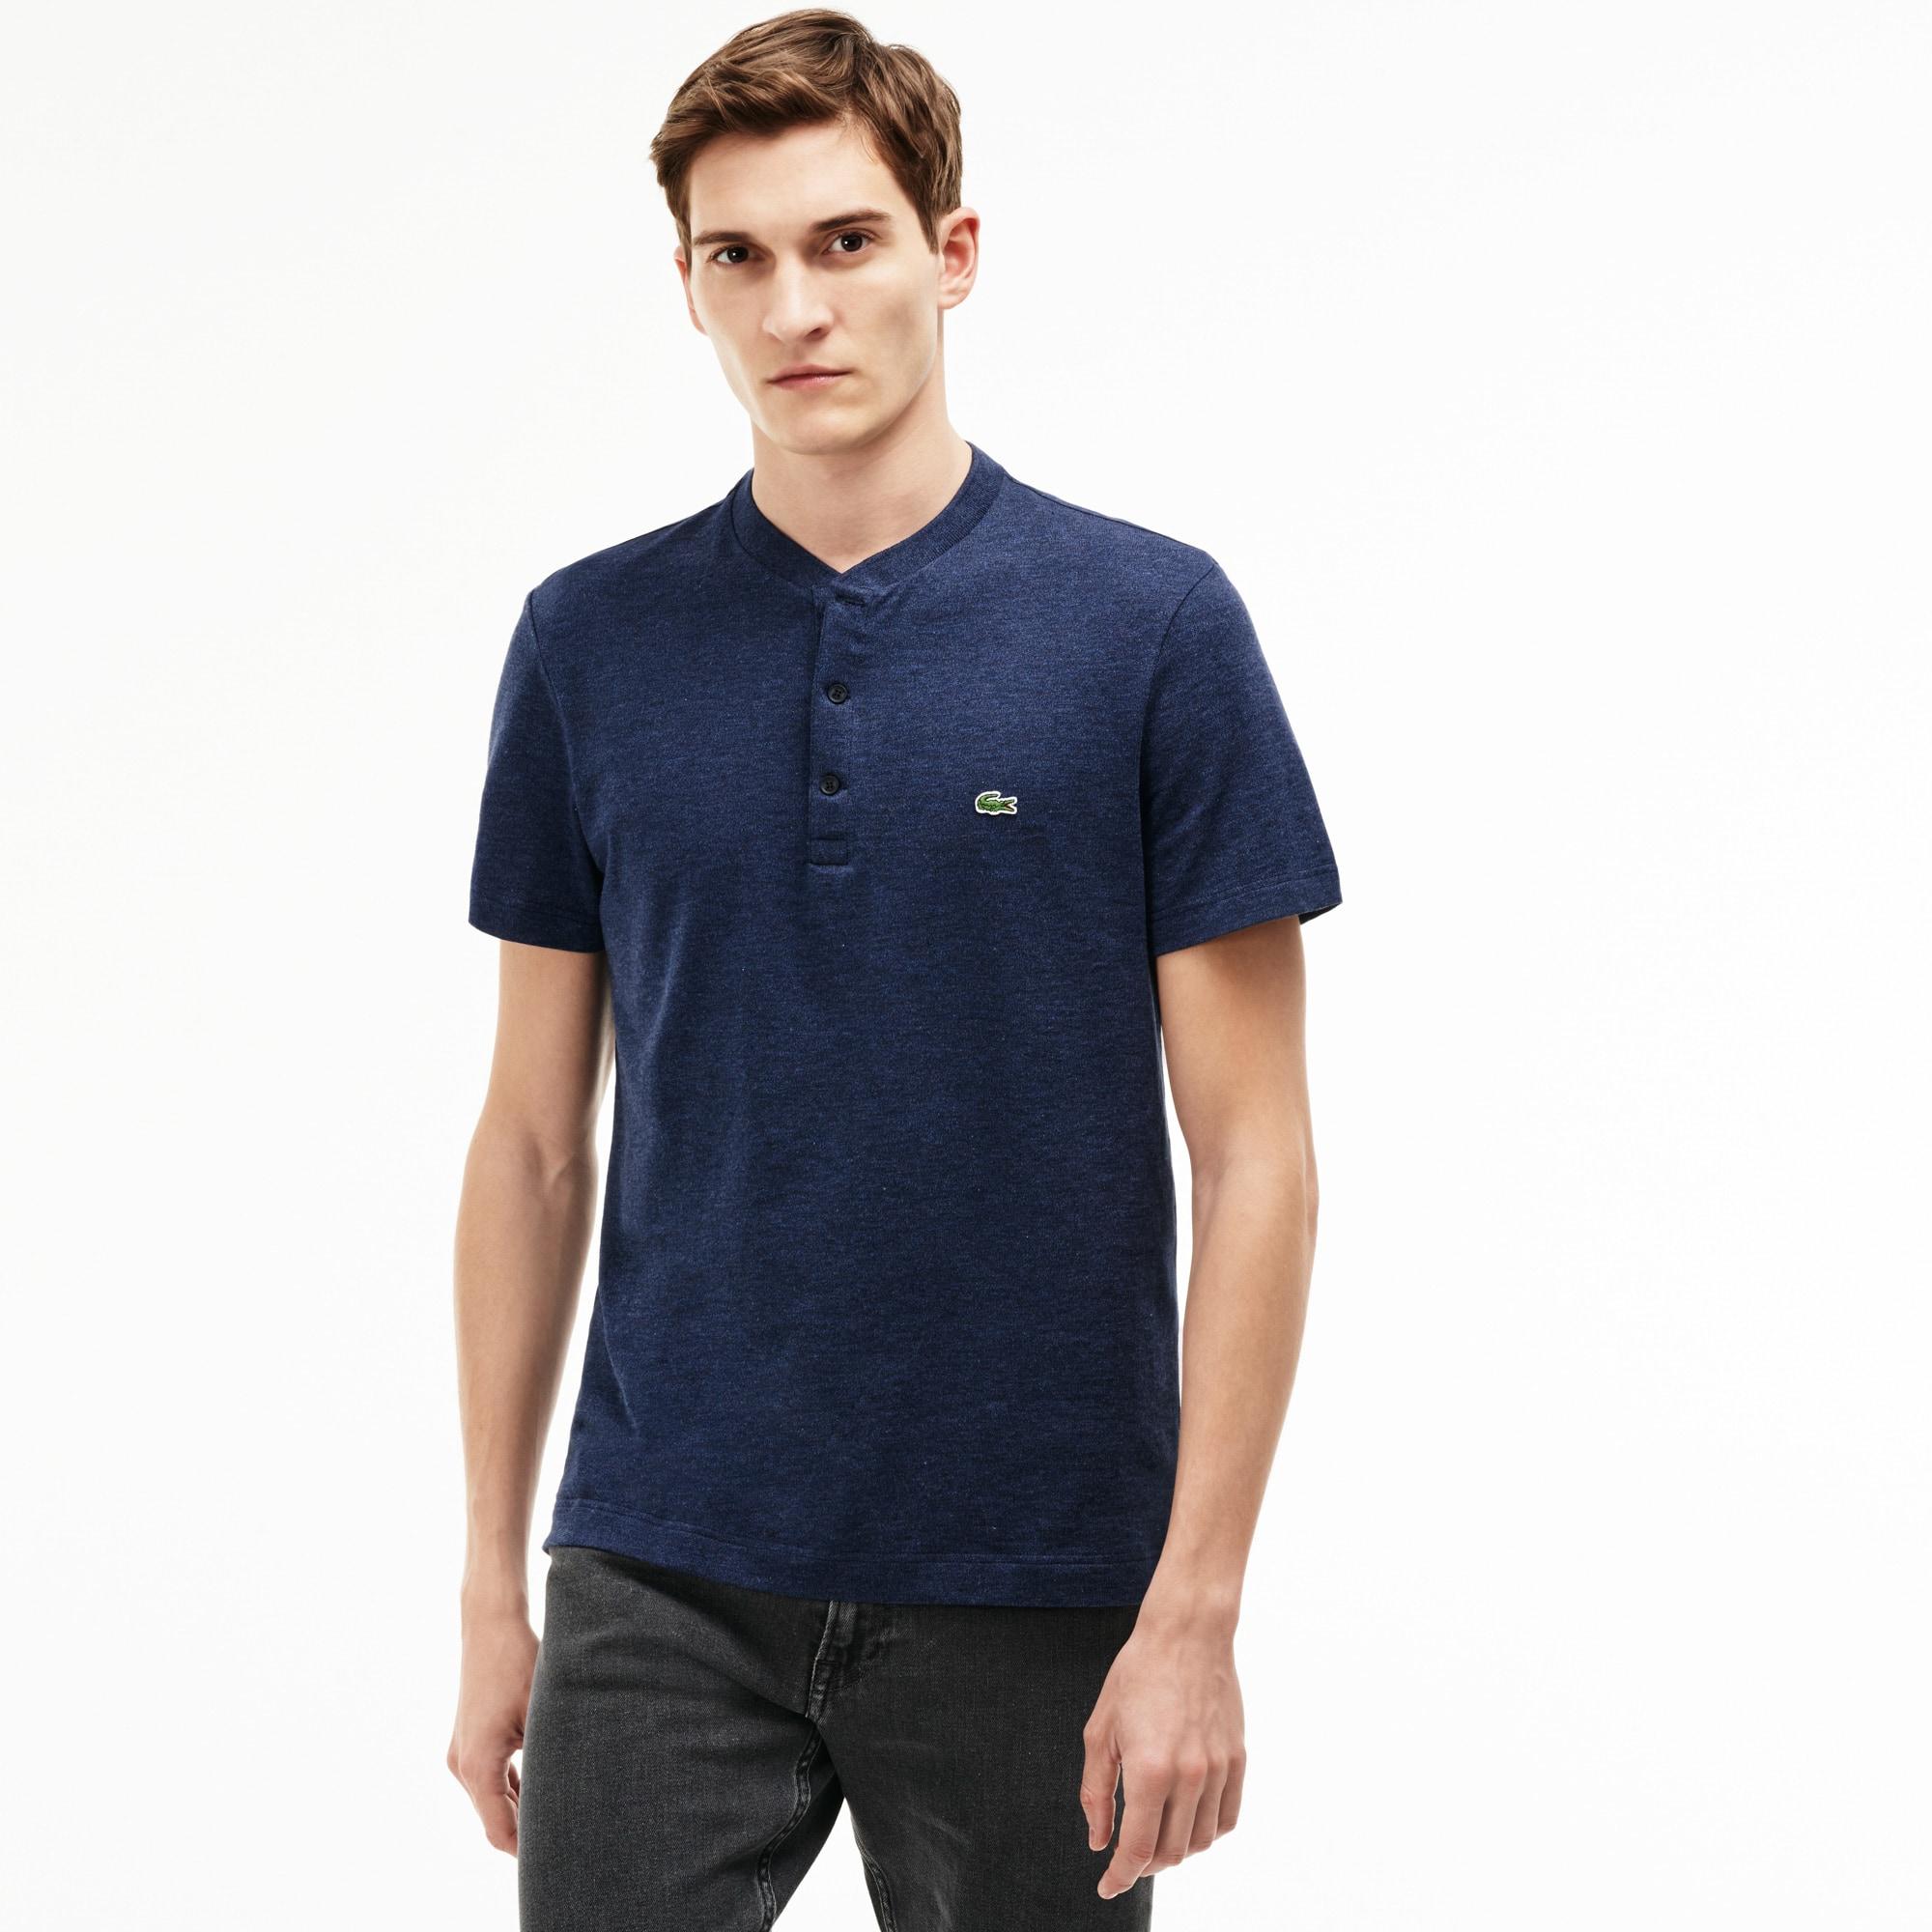 Men's Buttoned Crew Neck Flamme Cotton Jersey T-shirt